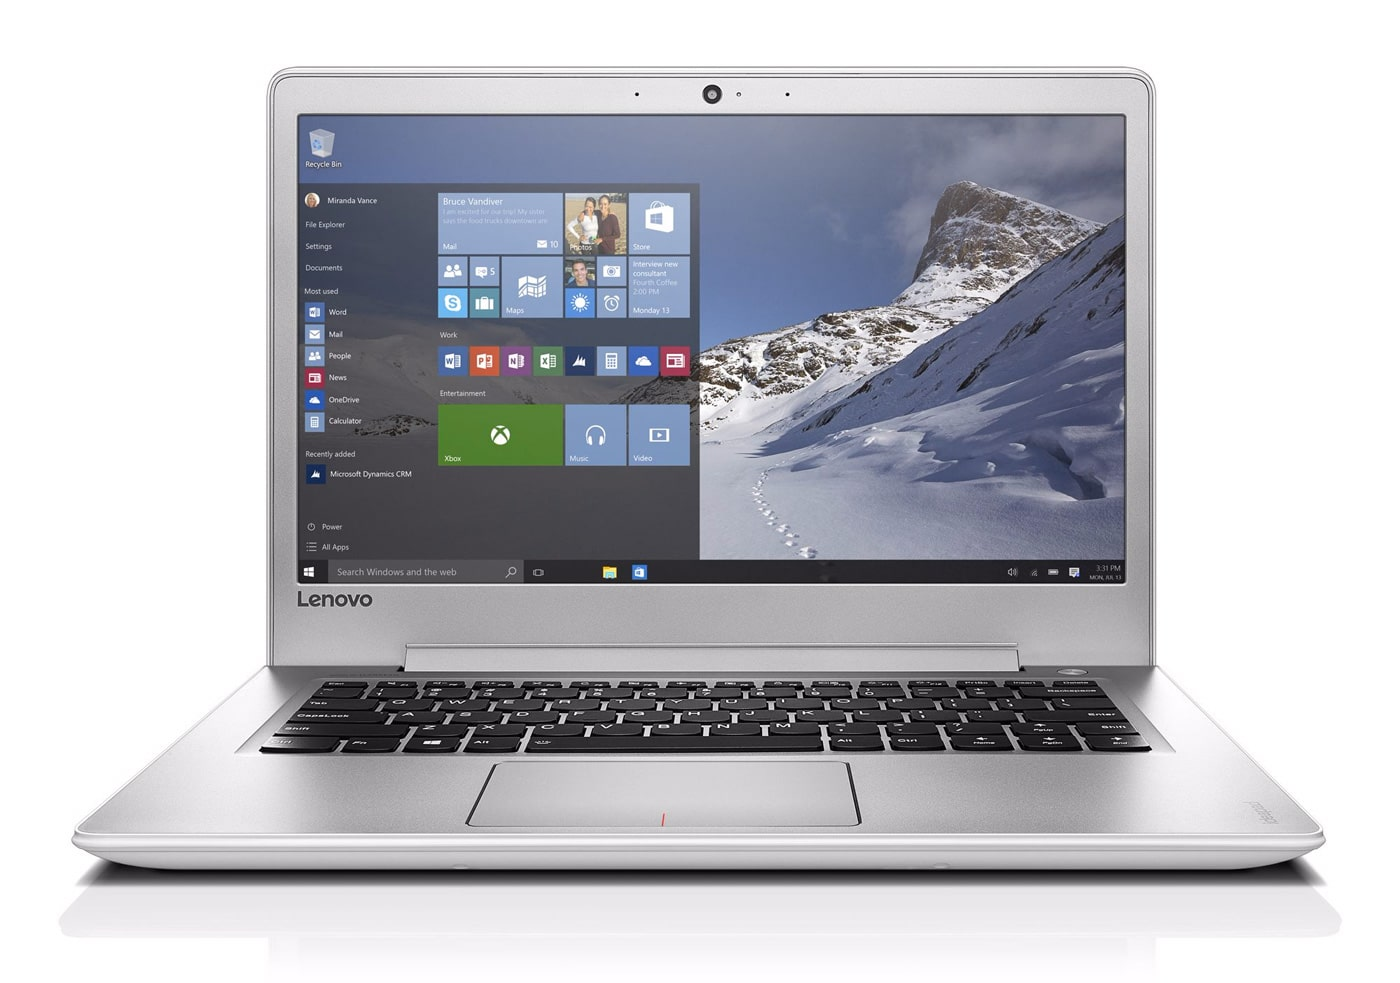 "<span class=""toptagtitre"">Promo 599€ ! </span>Lenovo Ideapad 510S-14ISK-4GFR, Ultrabook 14 pouces FHD SSD256"